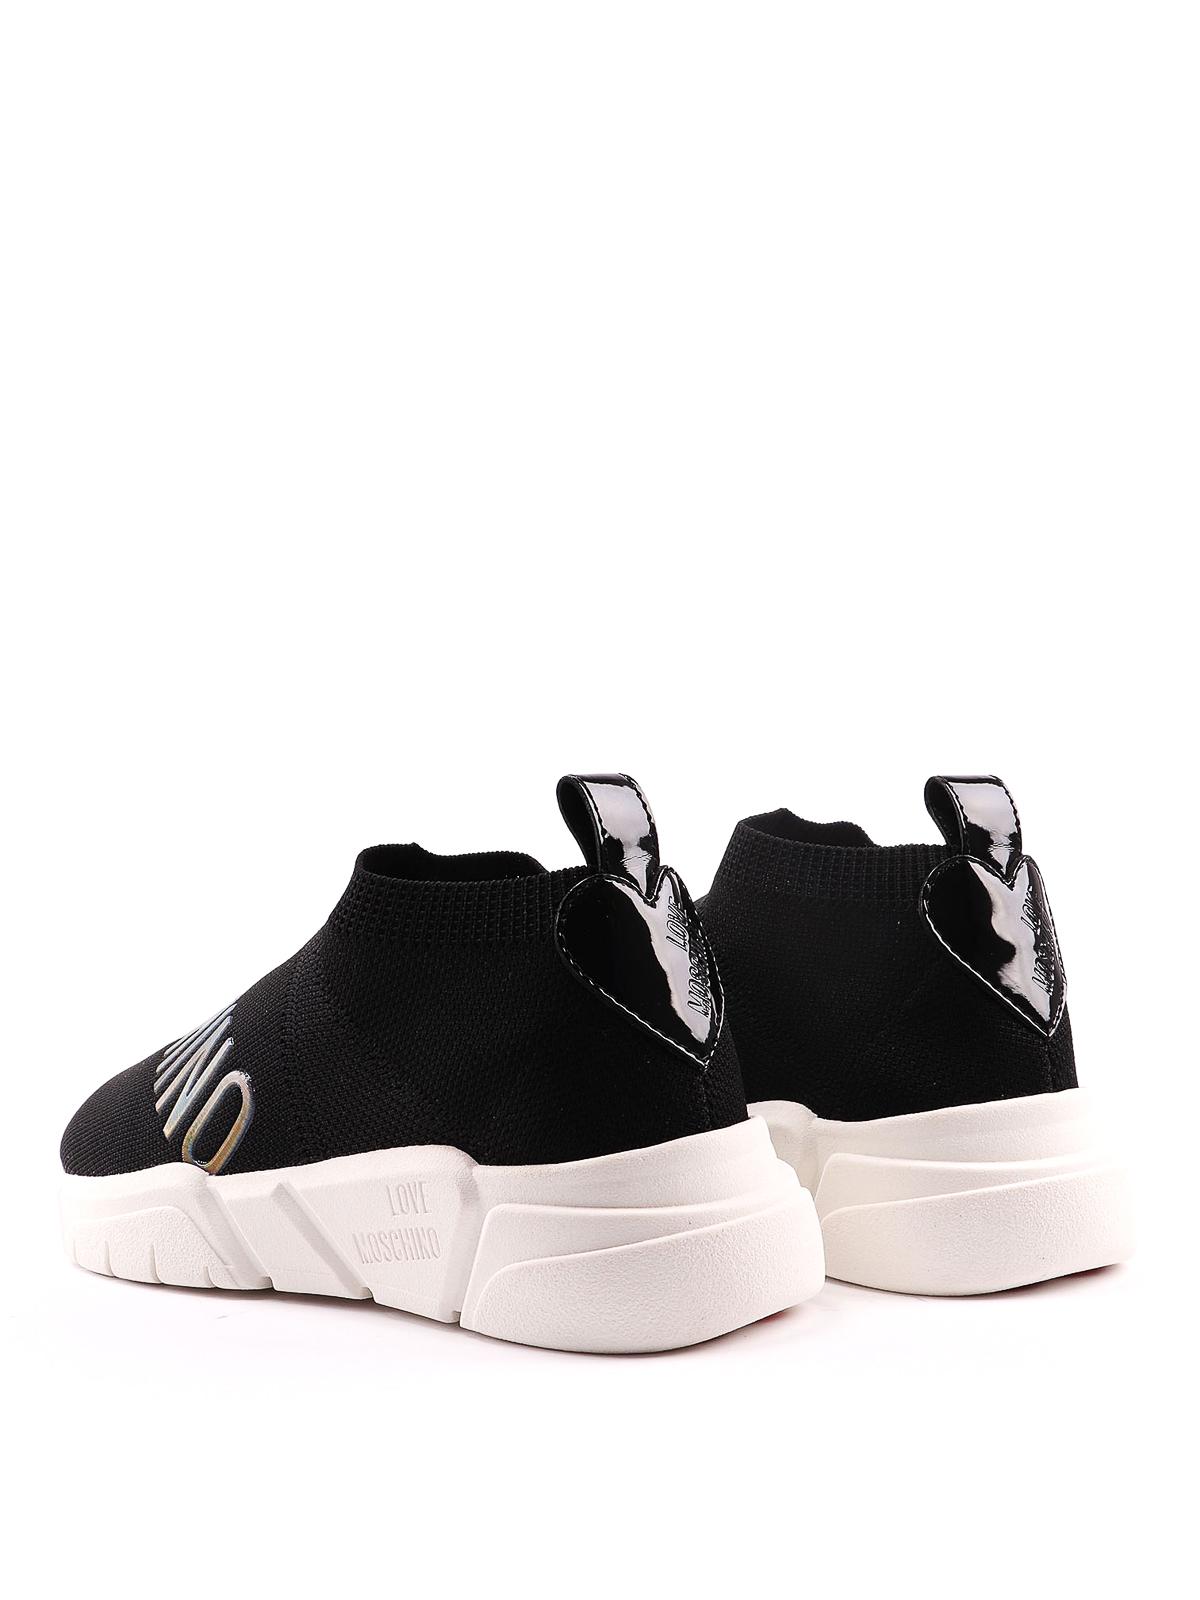 sock sneakers - trainers - JA15343IW0NERO